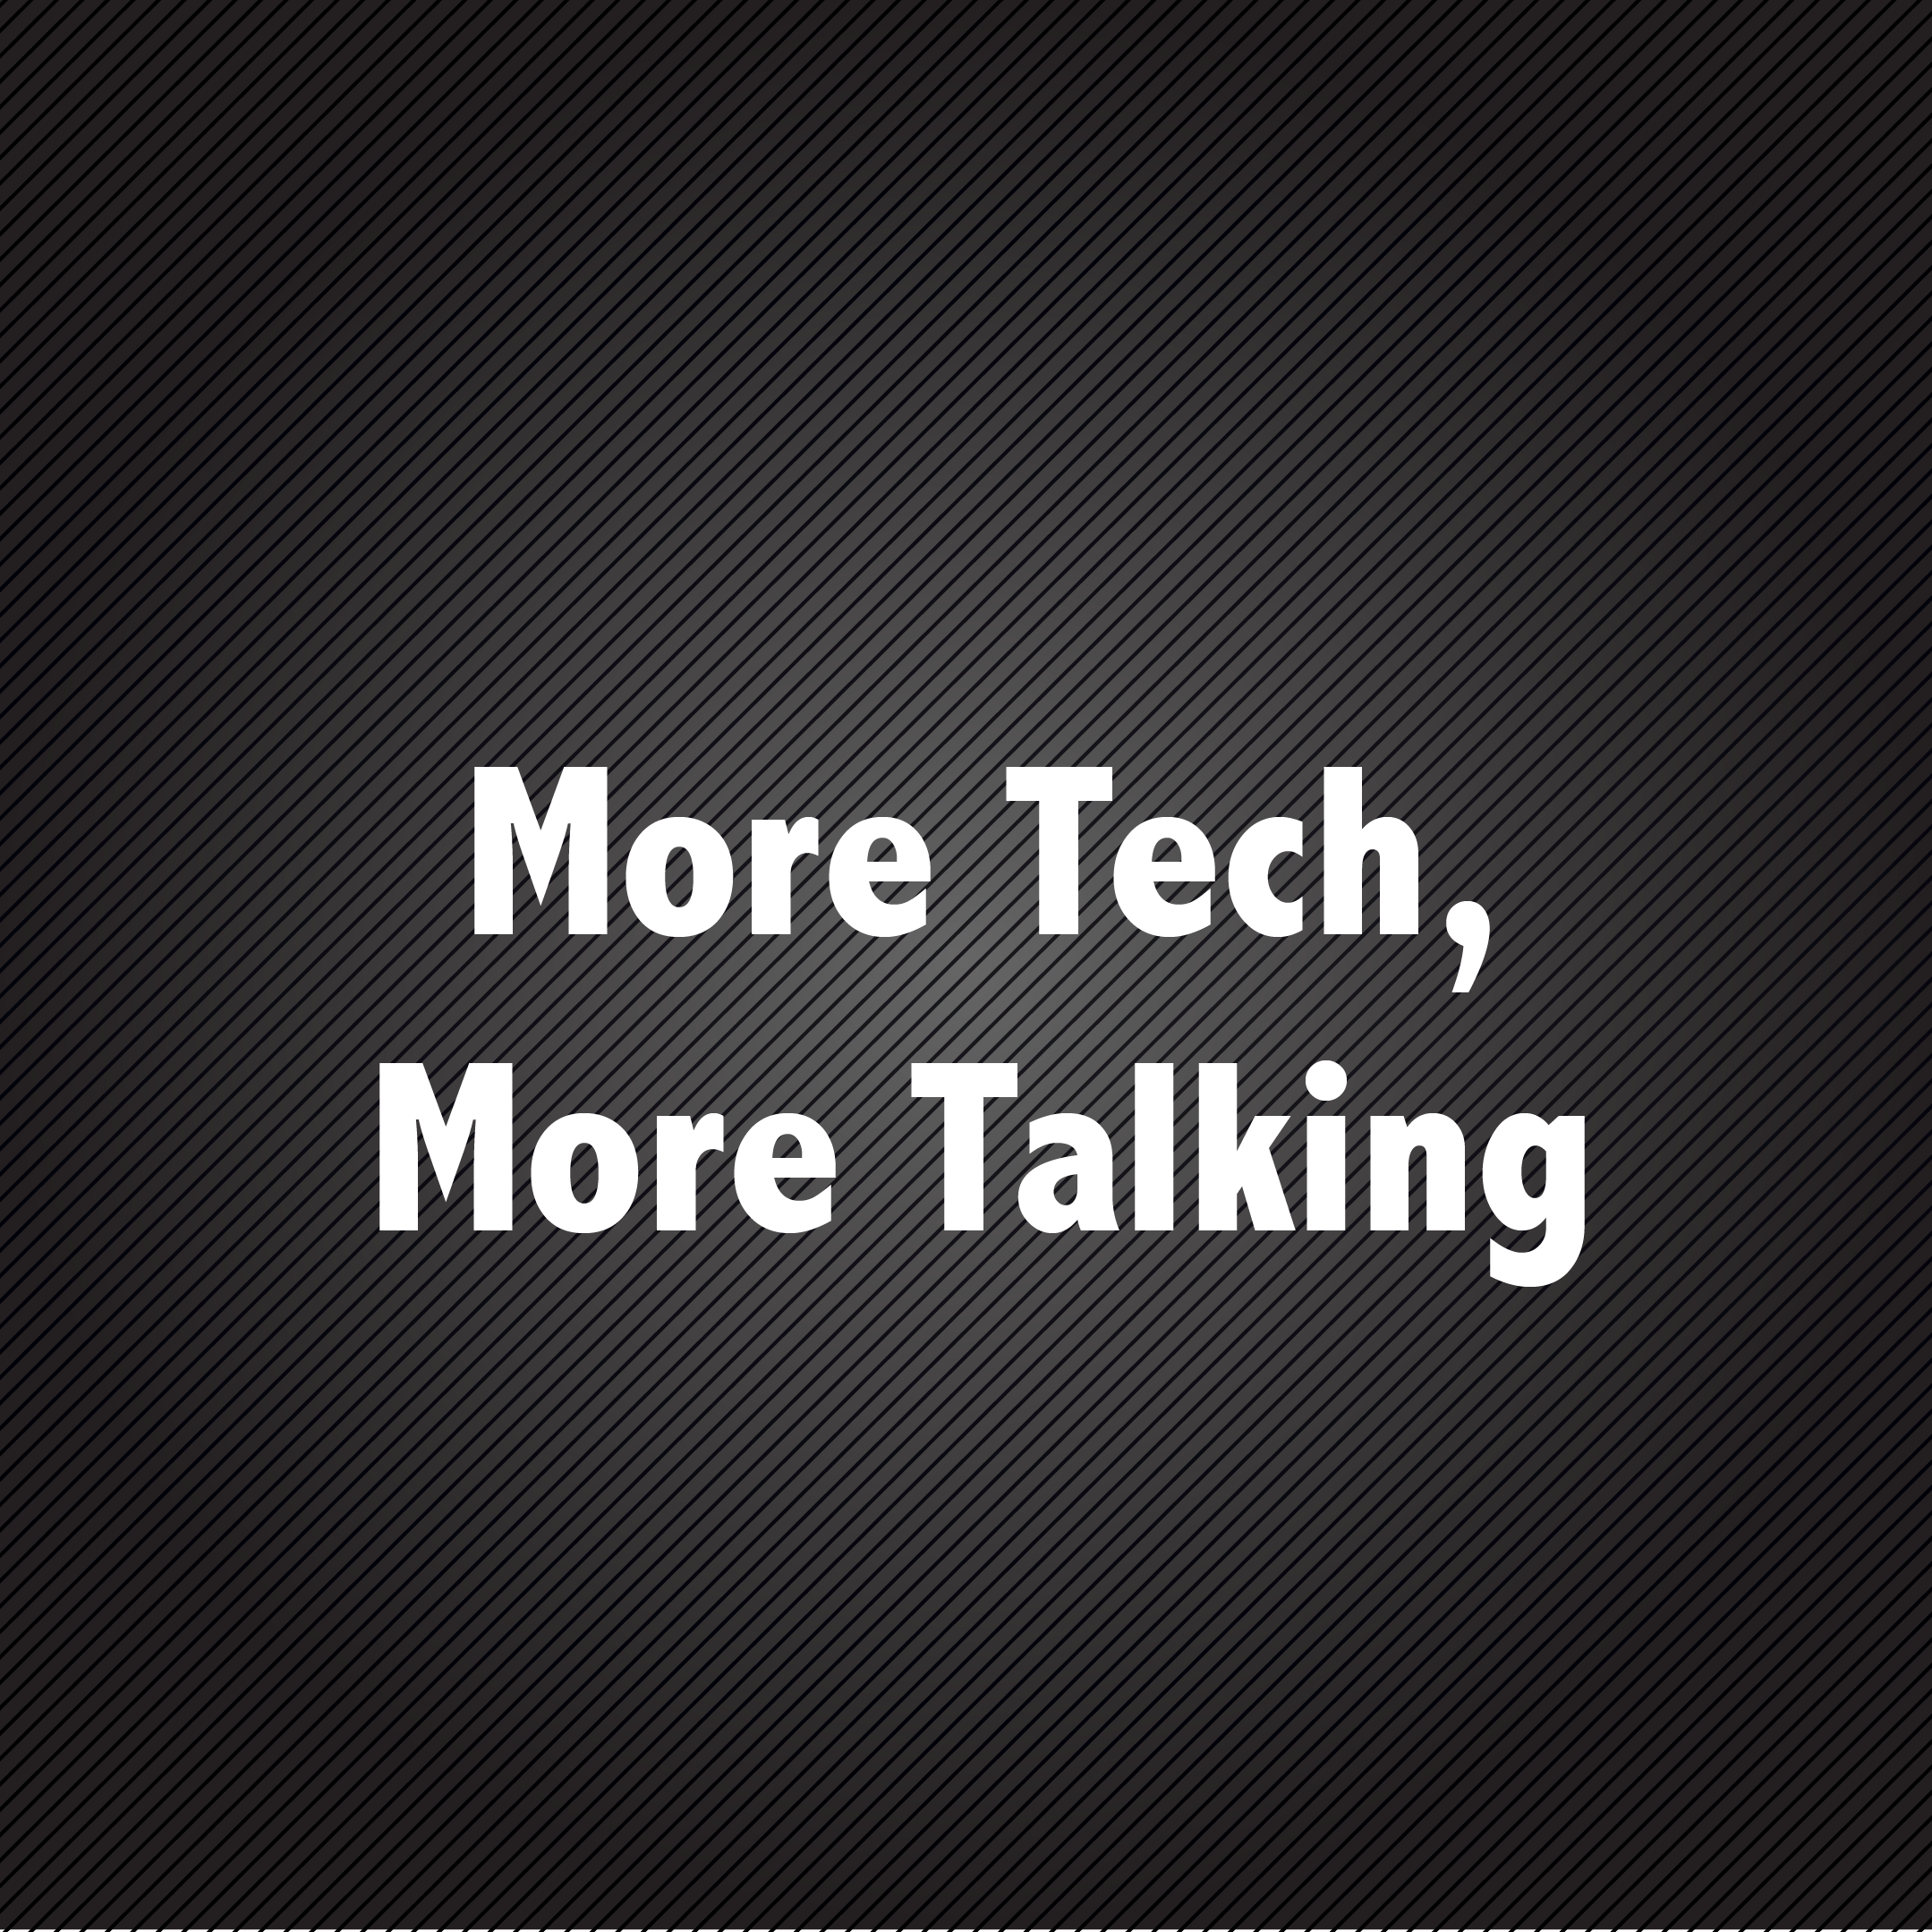 More Tech, More Talking